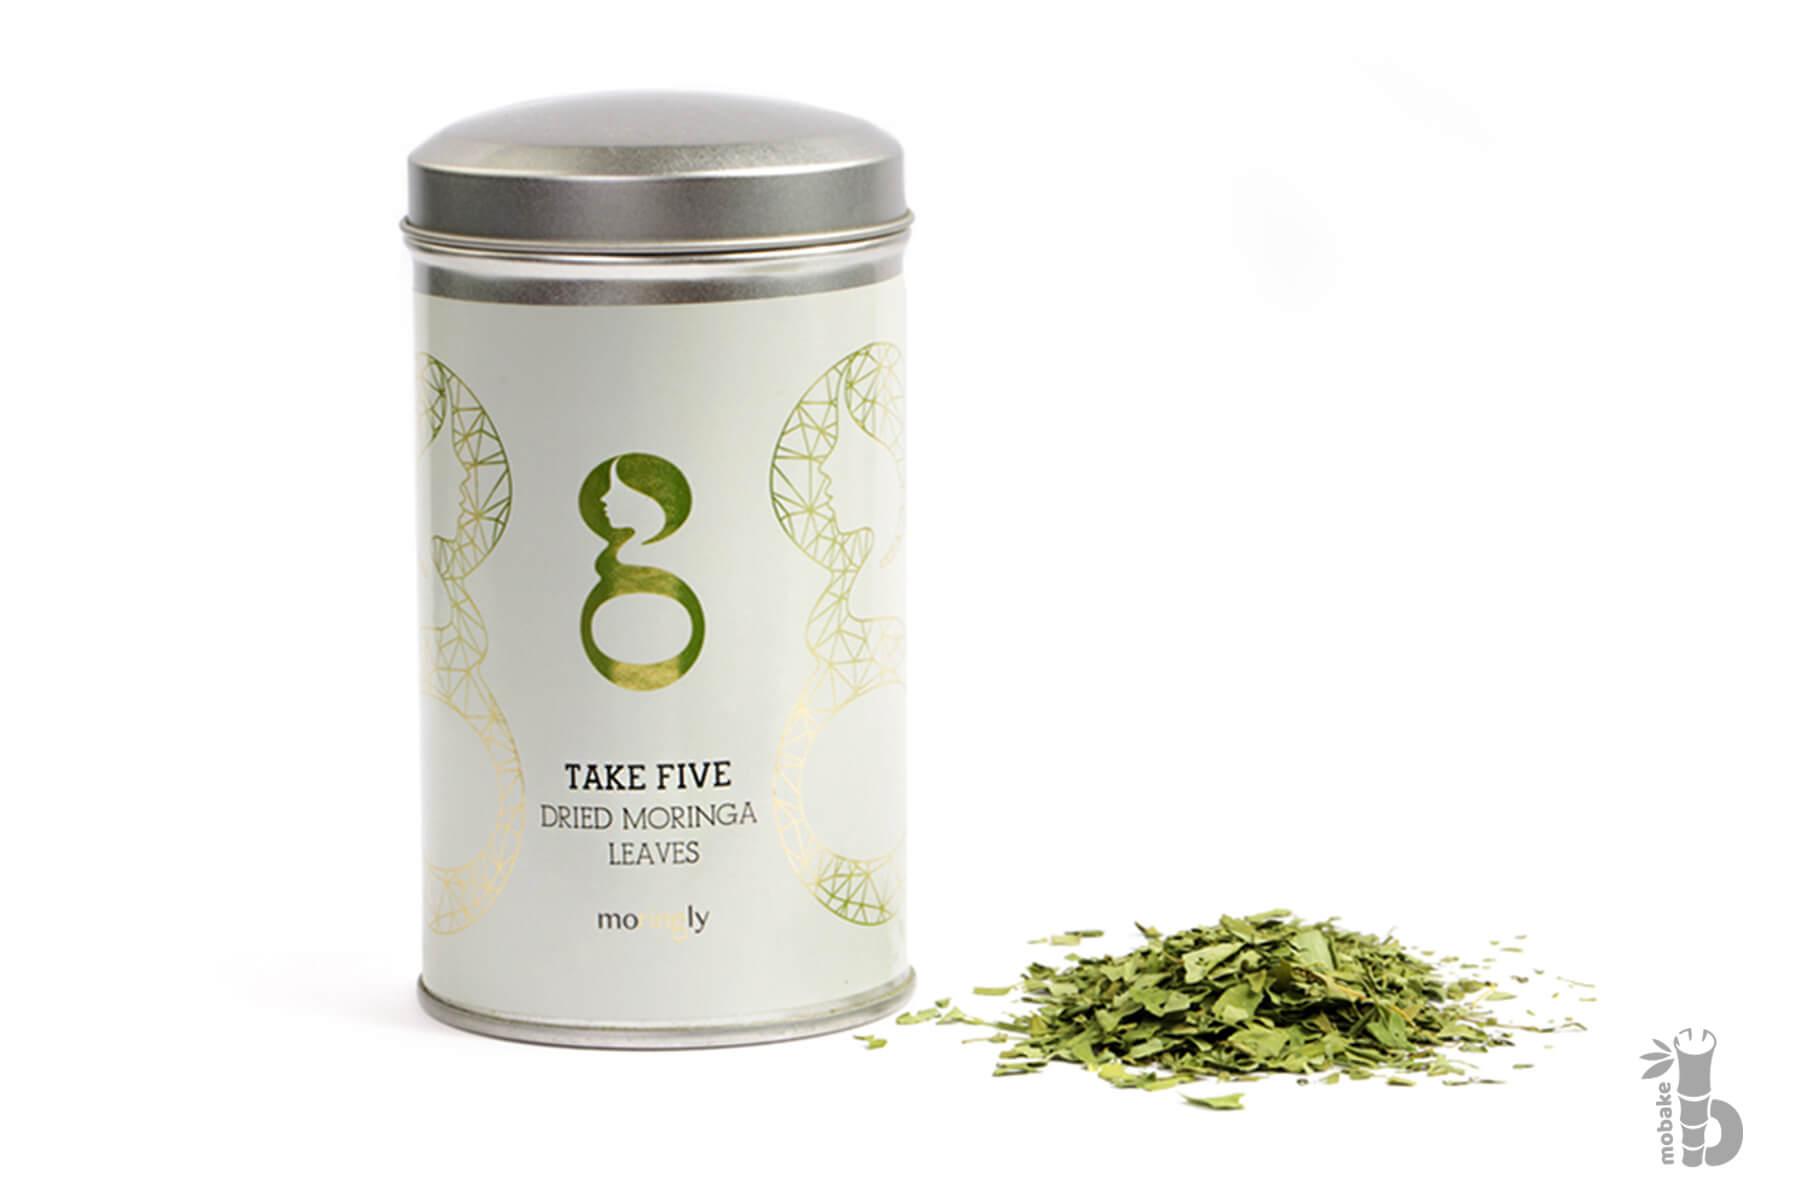 Moringly MORINGA TAKE FIVE | Sypaný čaj z Moringy | 40 g